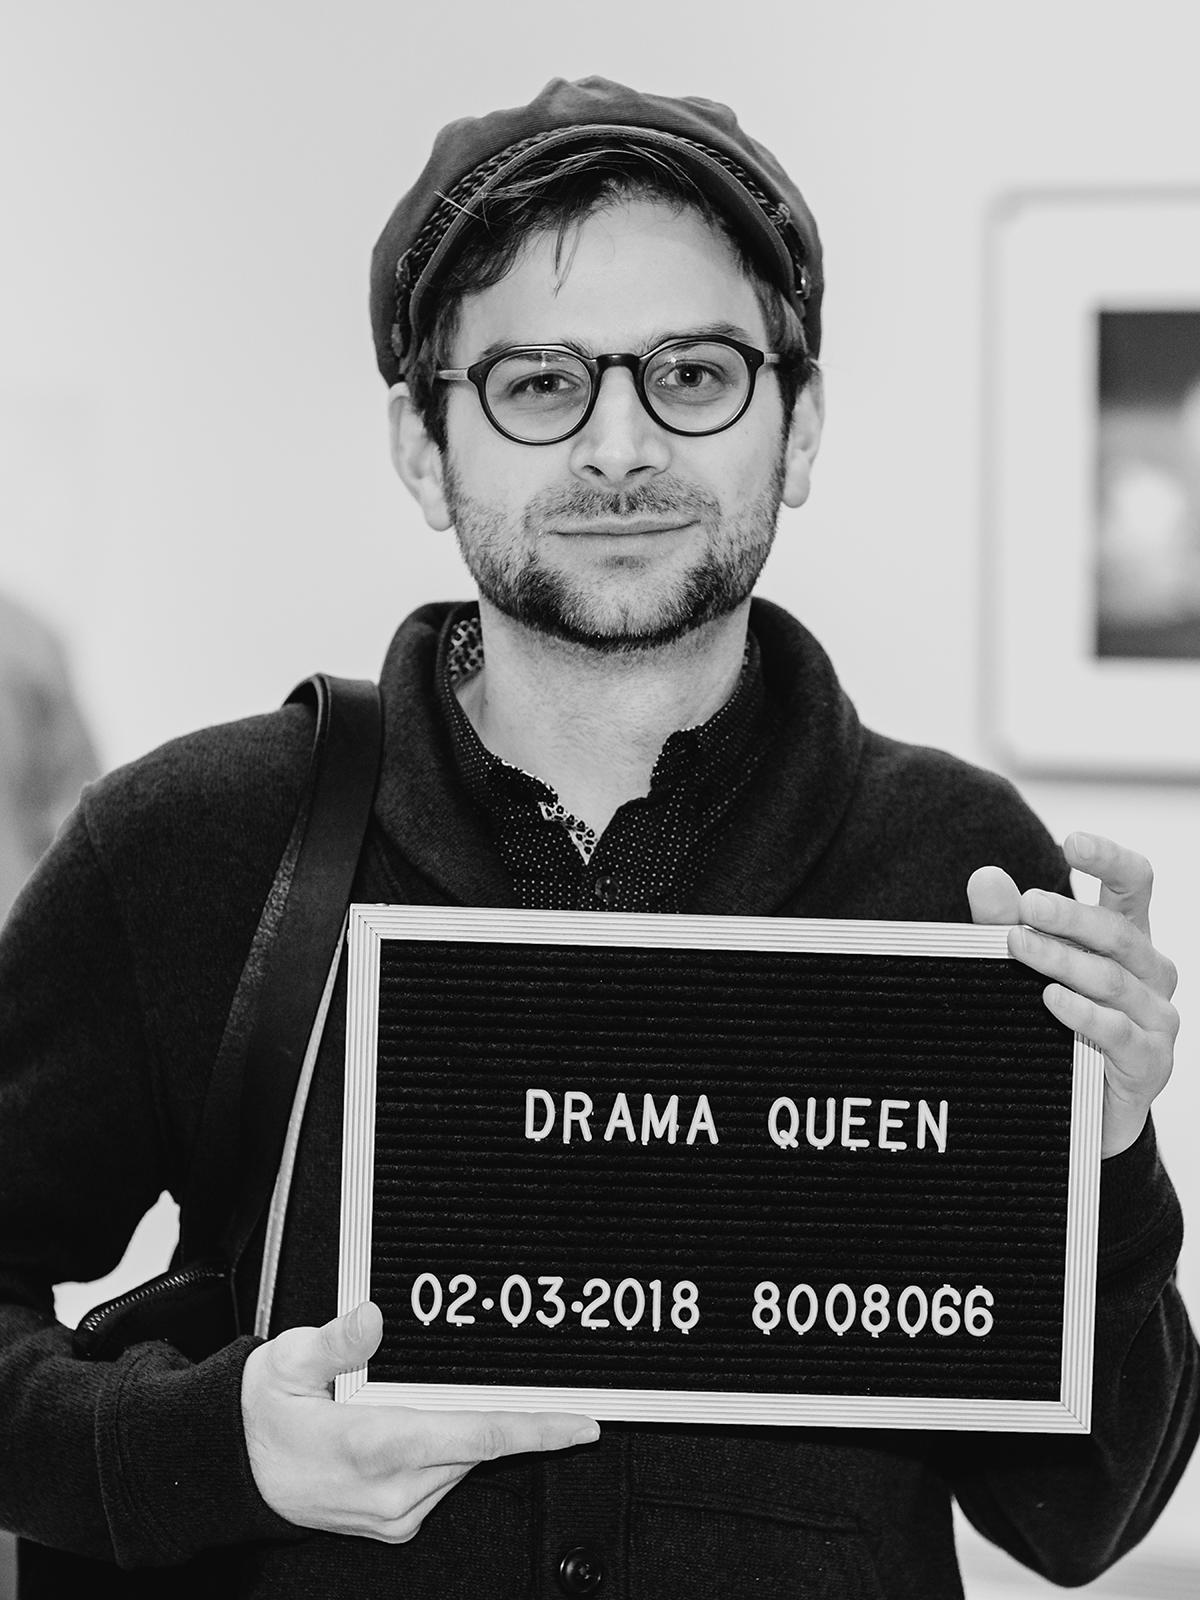 8008066 drama queen.jpg